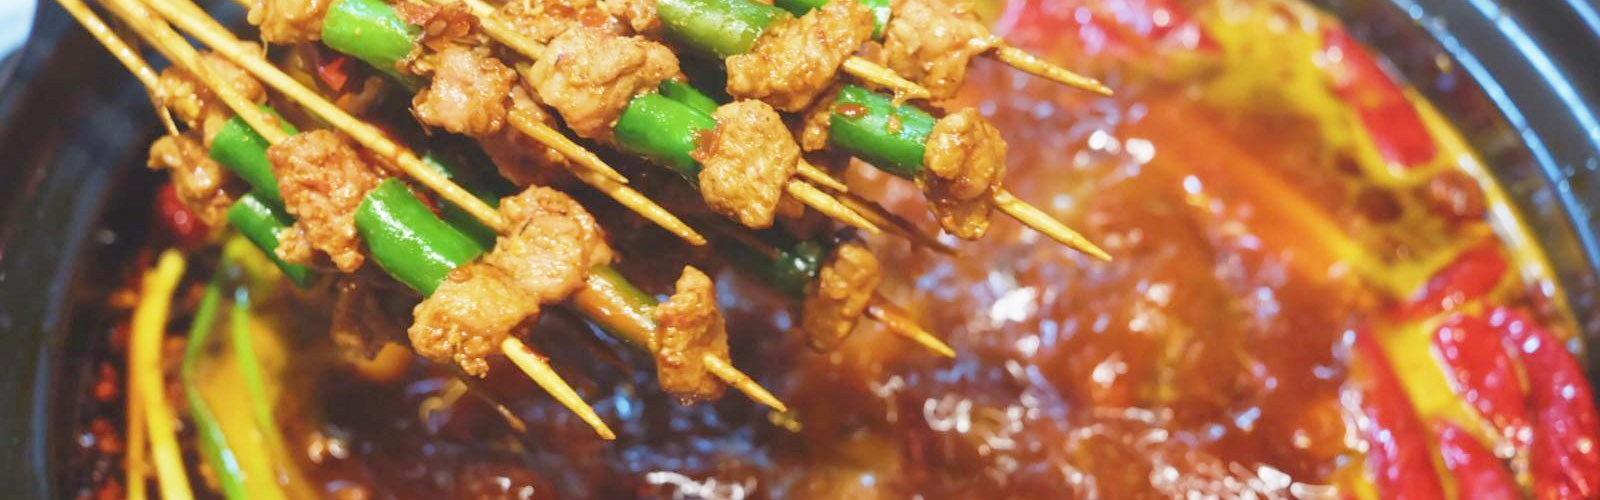 Chengdu'food'1600x500'1